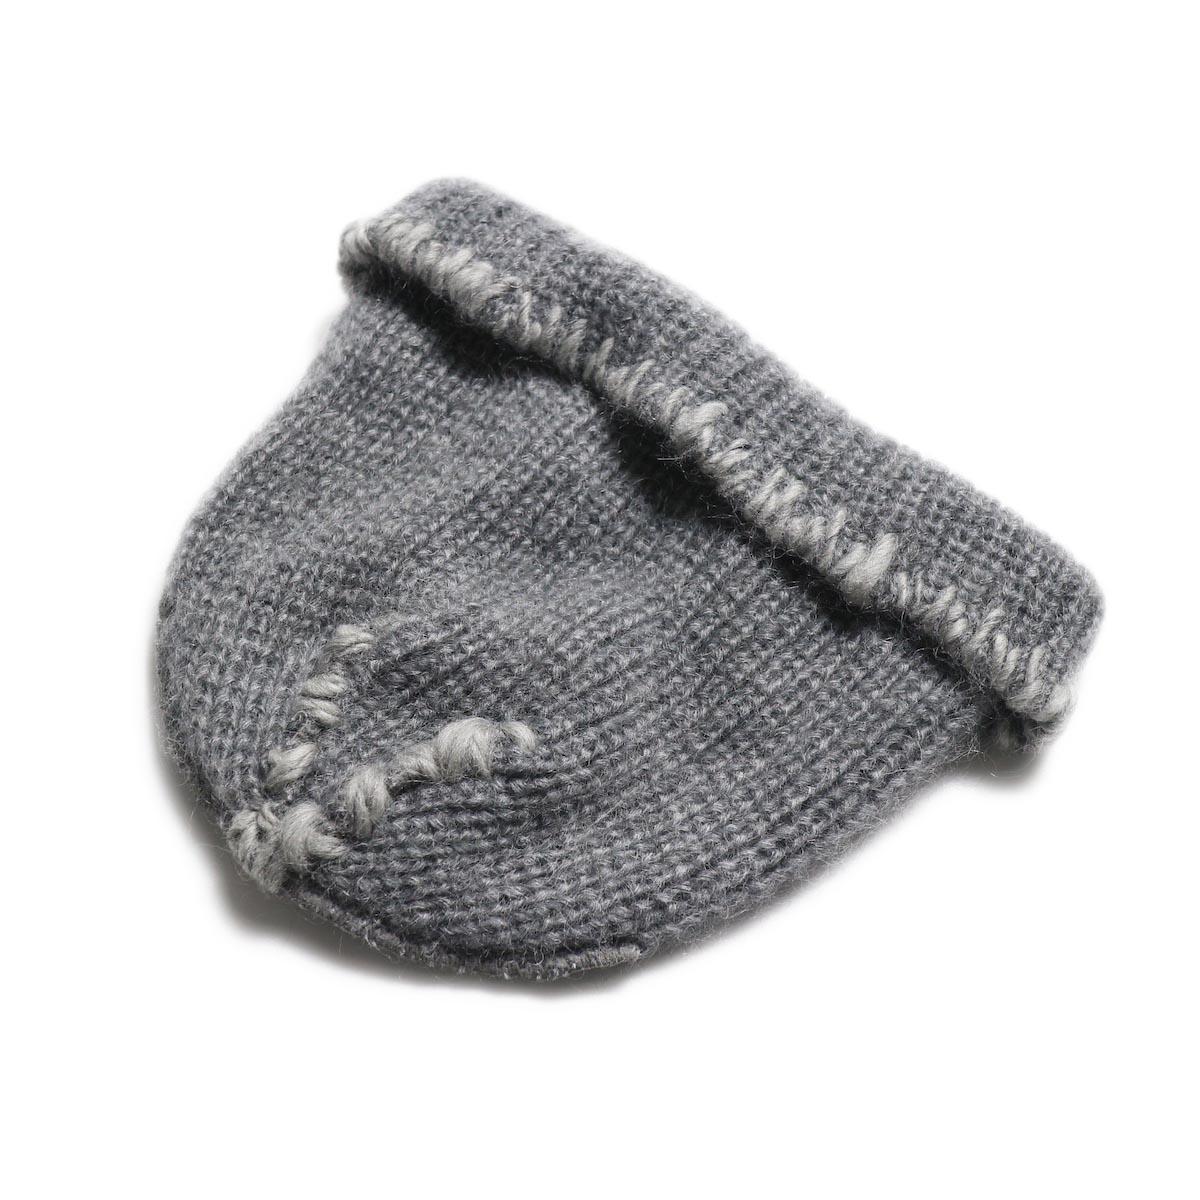 KIJIMA TAKAYUKI / Damage Knit Cap (KN182909) GRAY 逆側